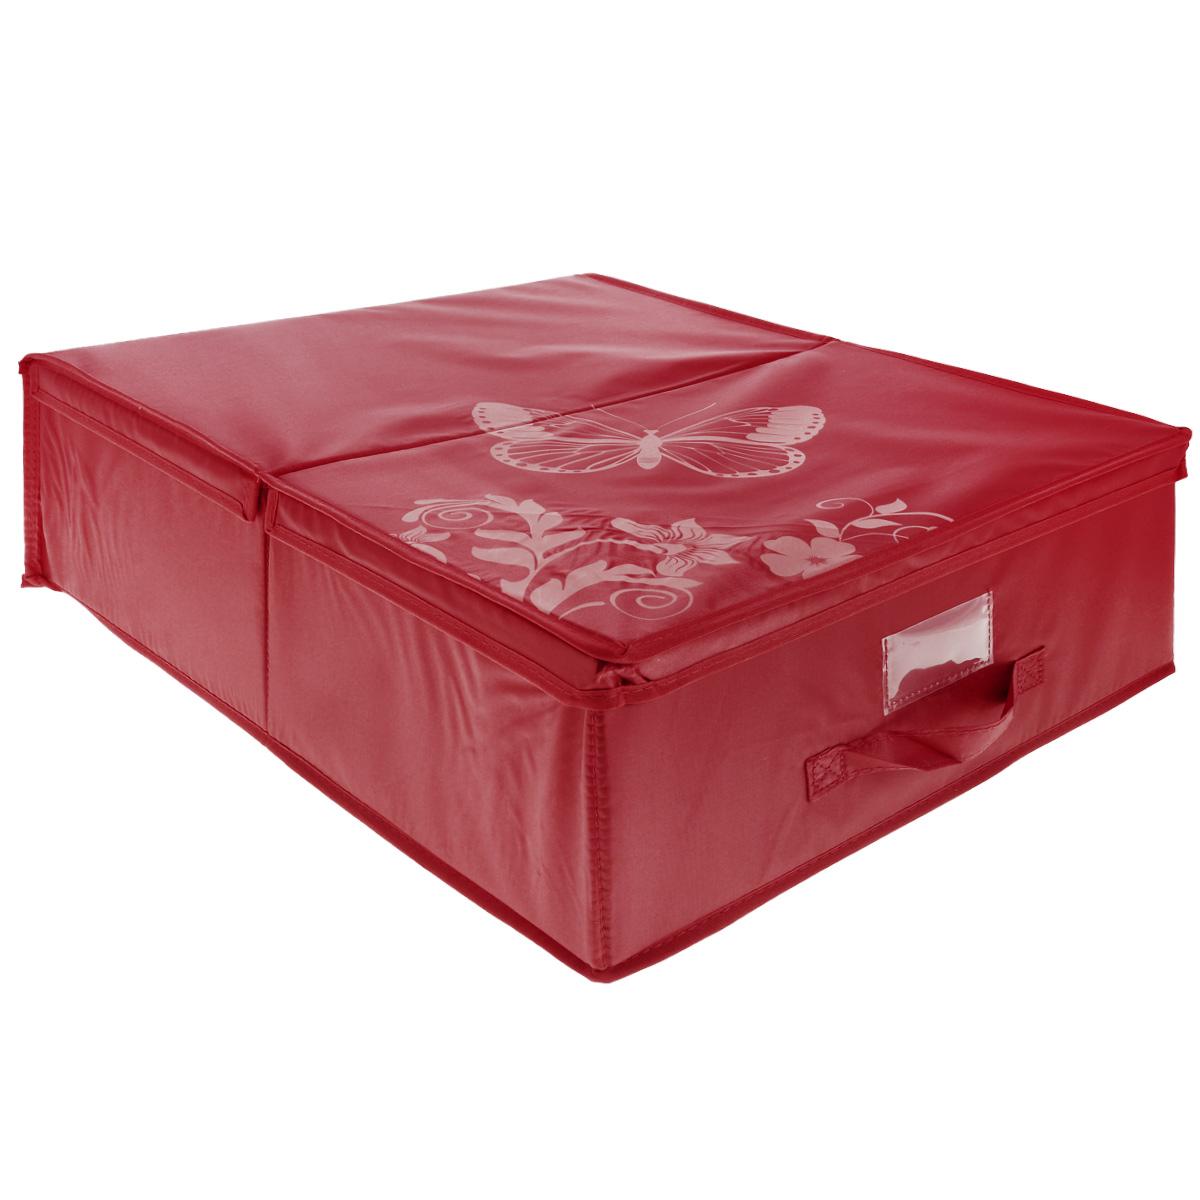 "Кофр подкроватный Hausmann ""Butterfly"", цвет: красный, 43 см х 54 см х 18 см"